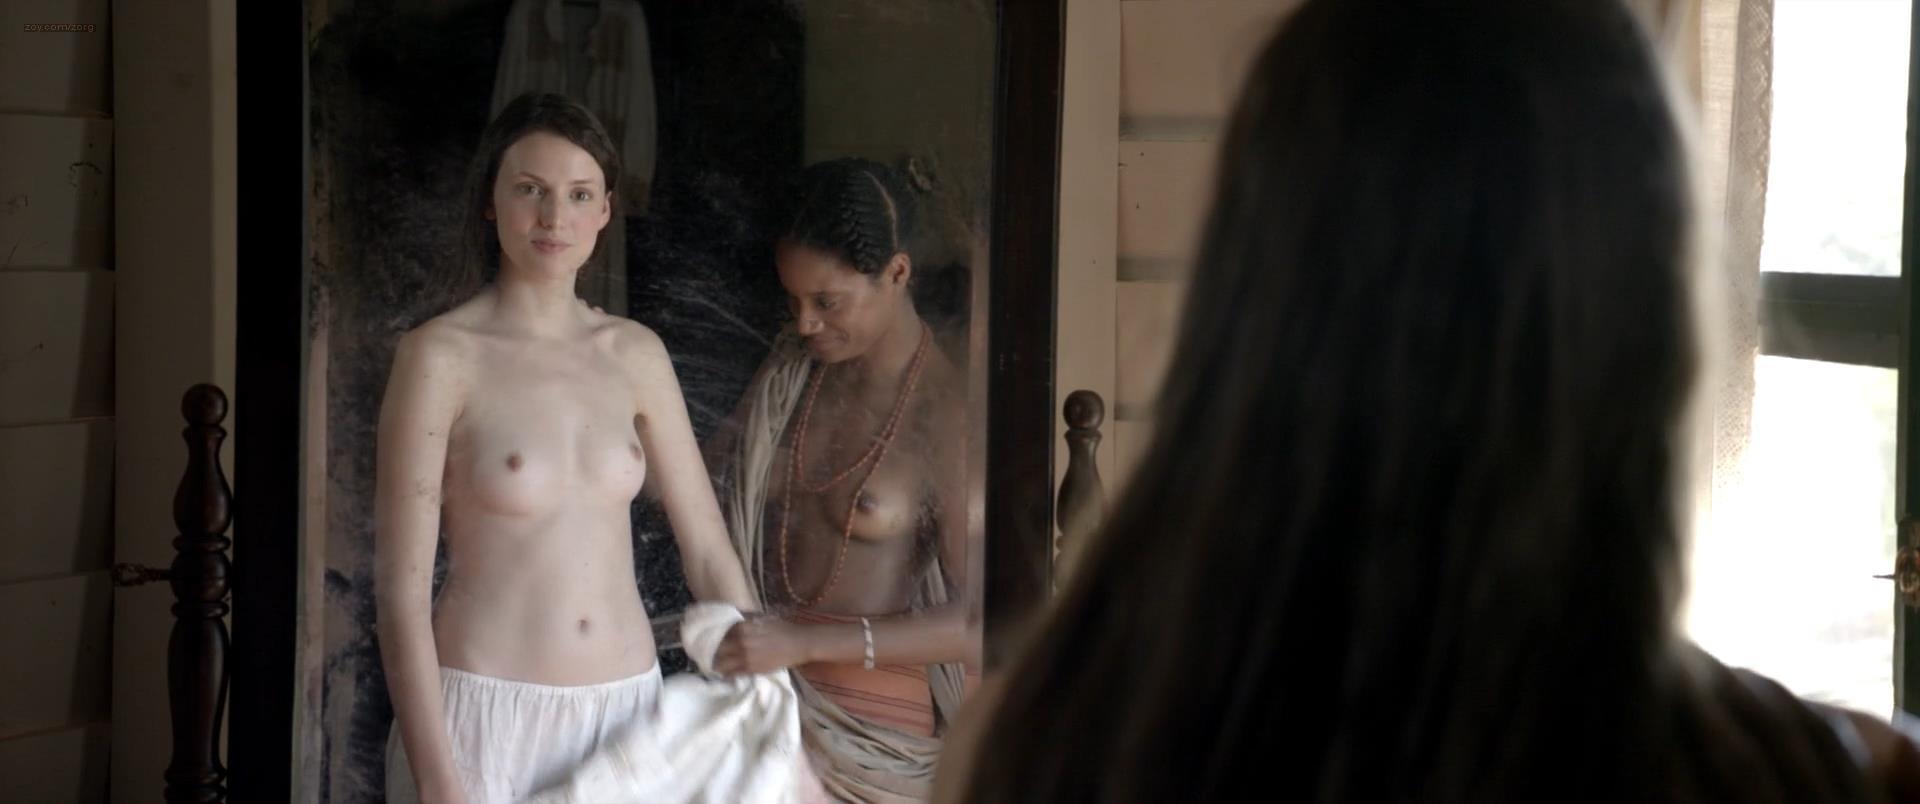 Buck naked women pics